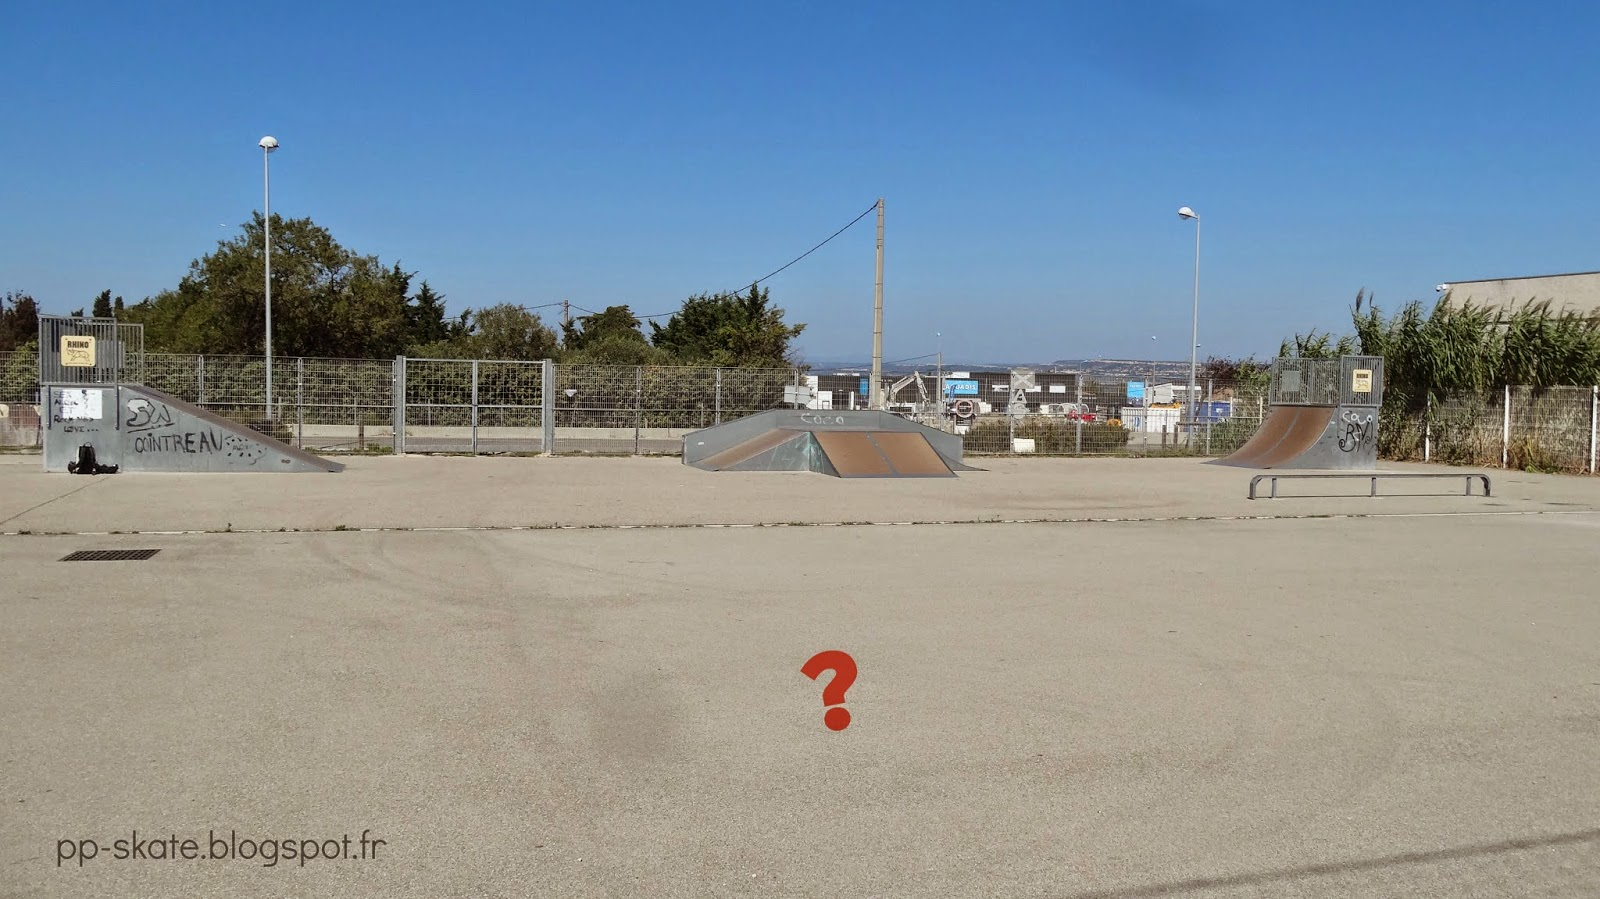 skatepark chateauneuf les martigues